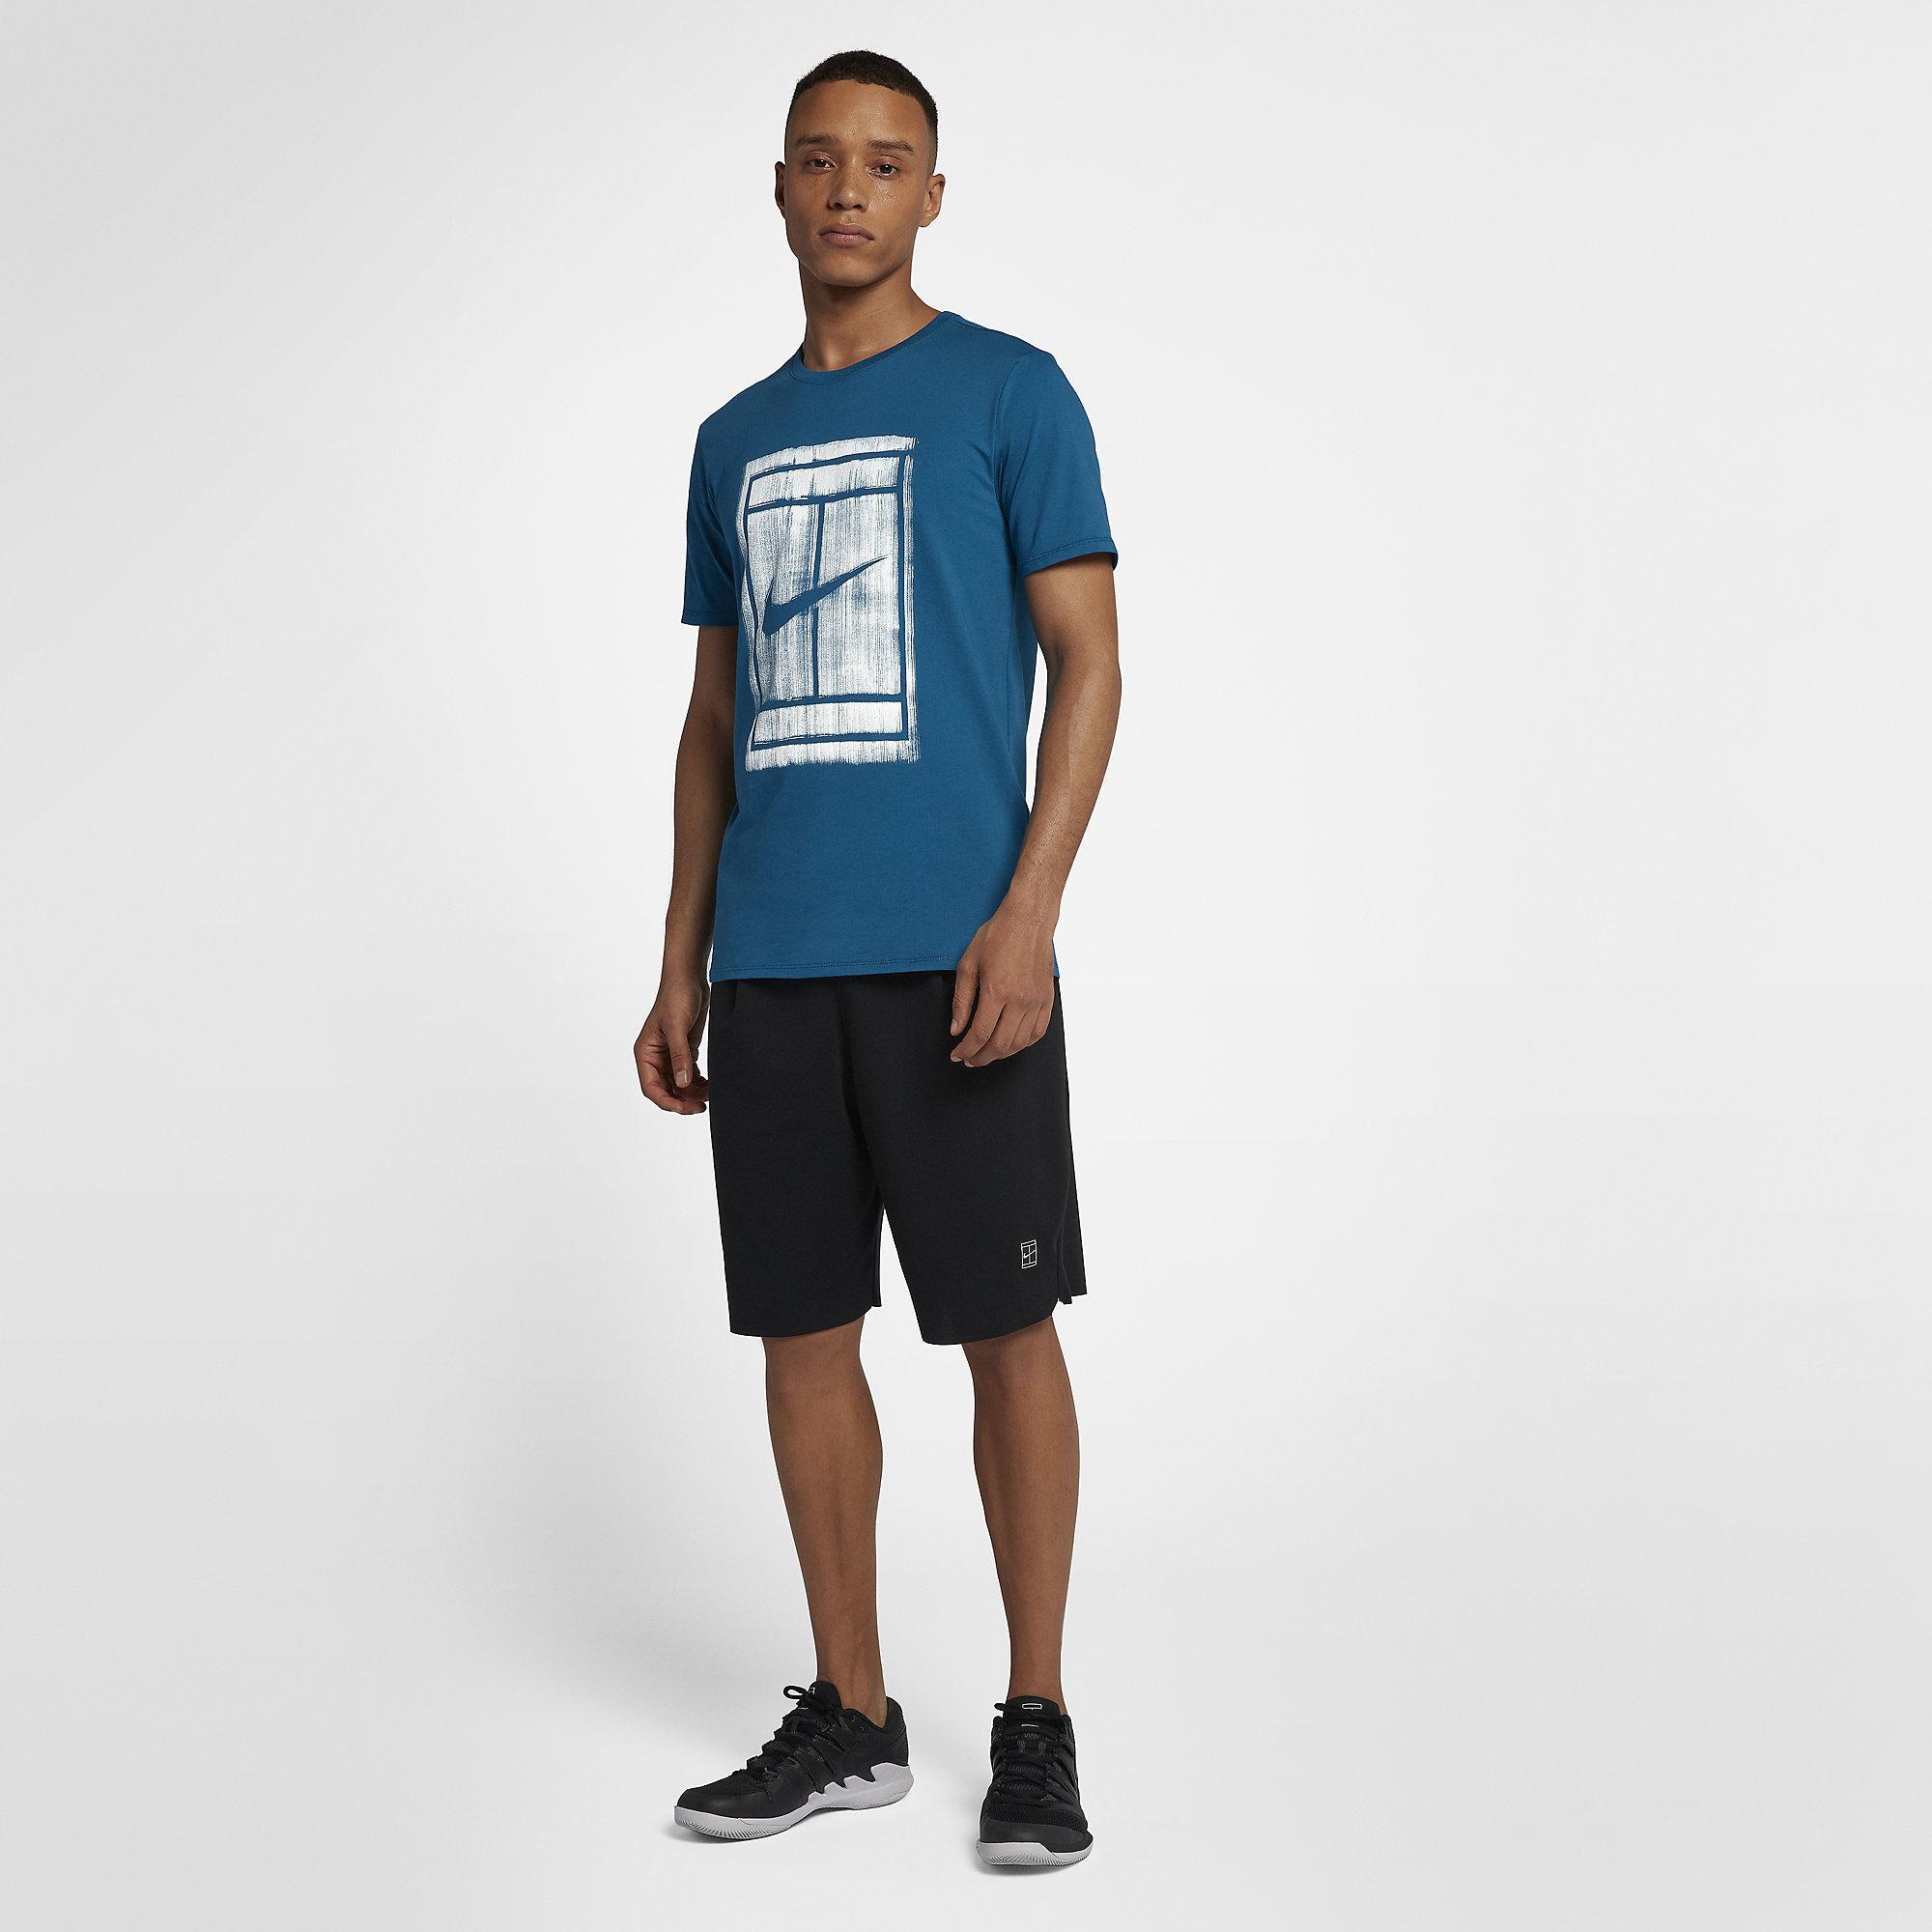 73bb3889 Nike Mens Court Graphic T-Shirt - Green Abyss/White - Tennisnuts.com